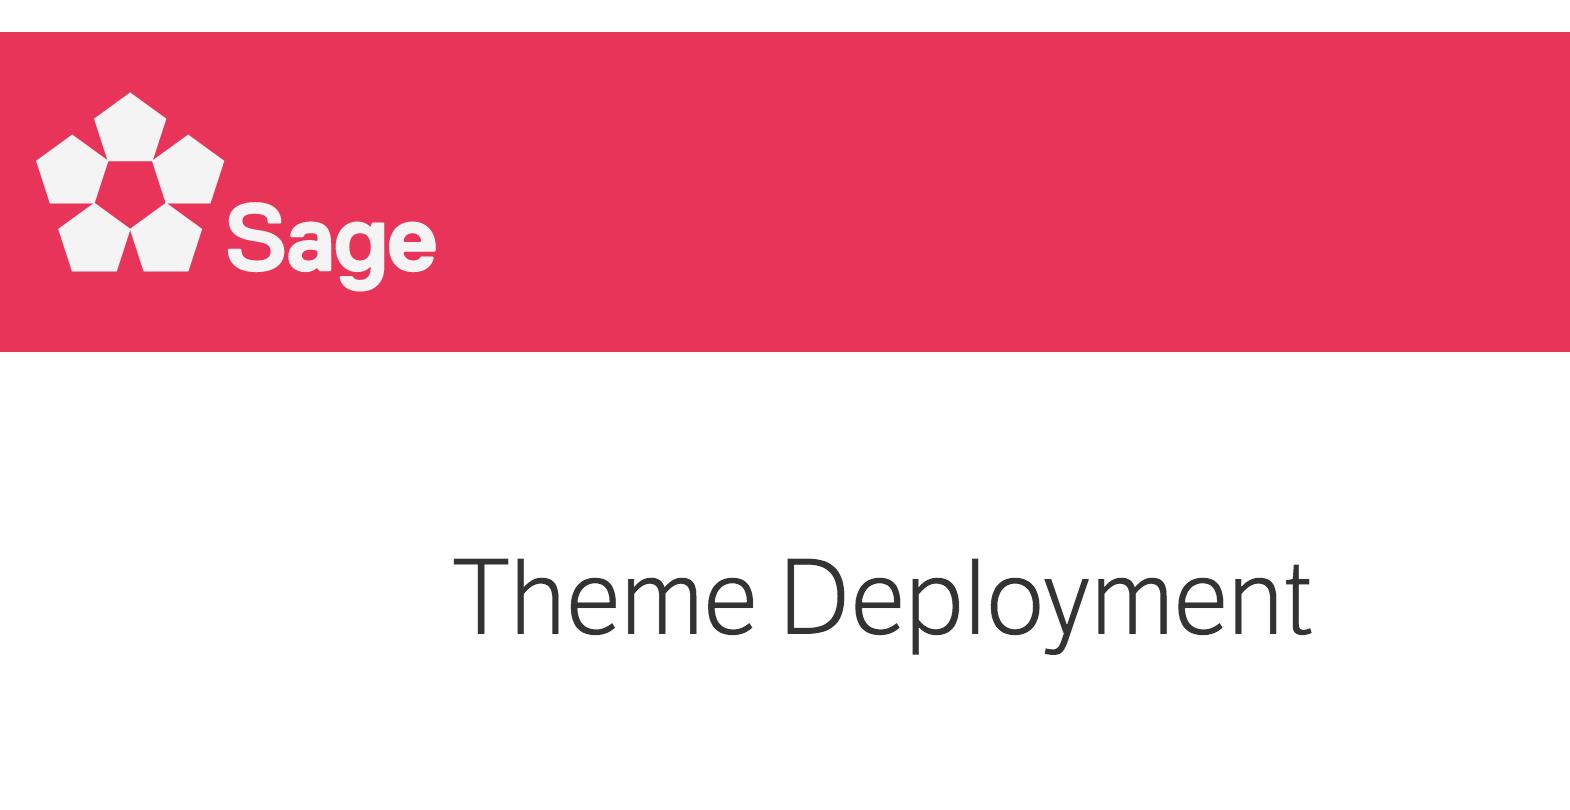 Sage Theme Deployment